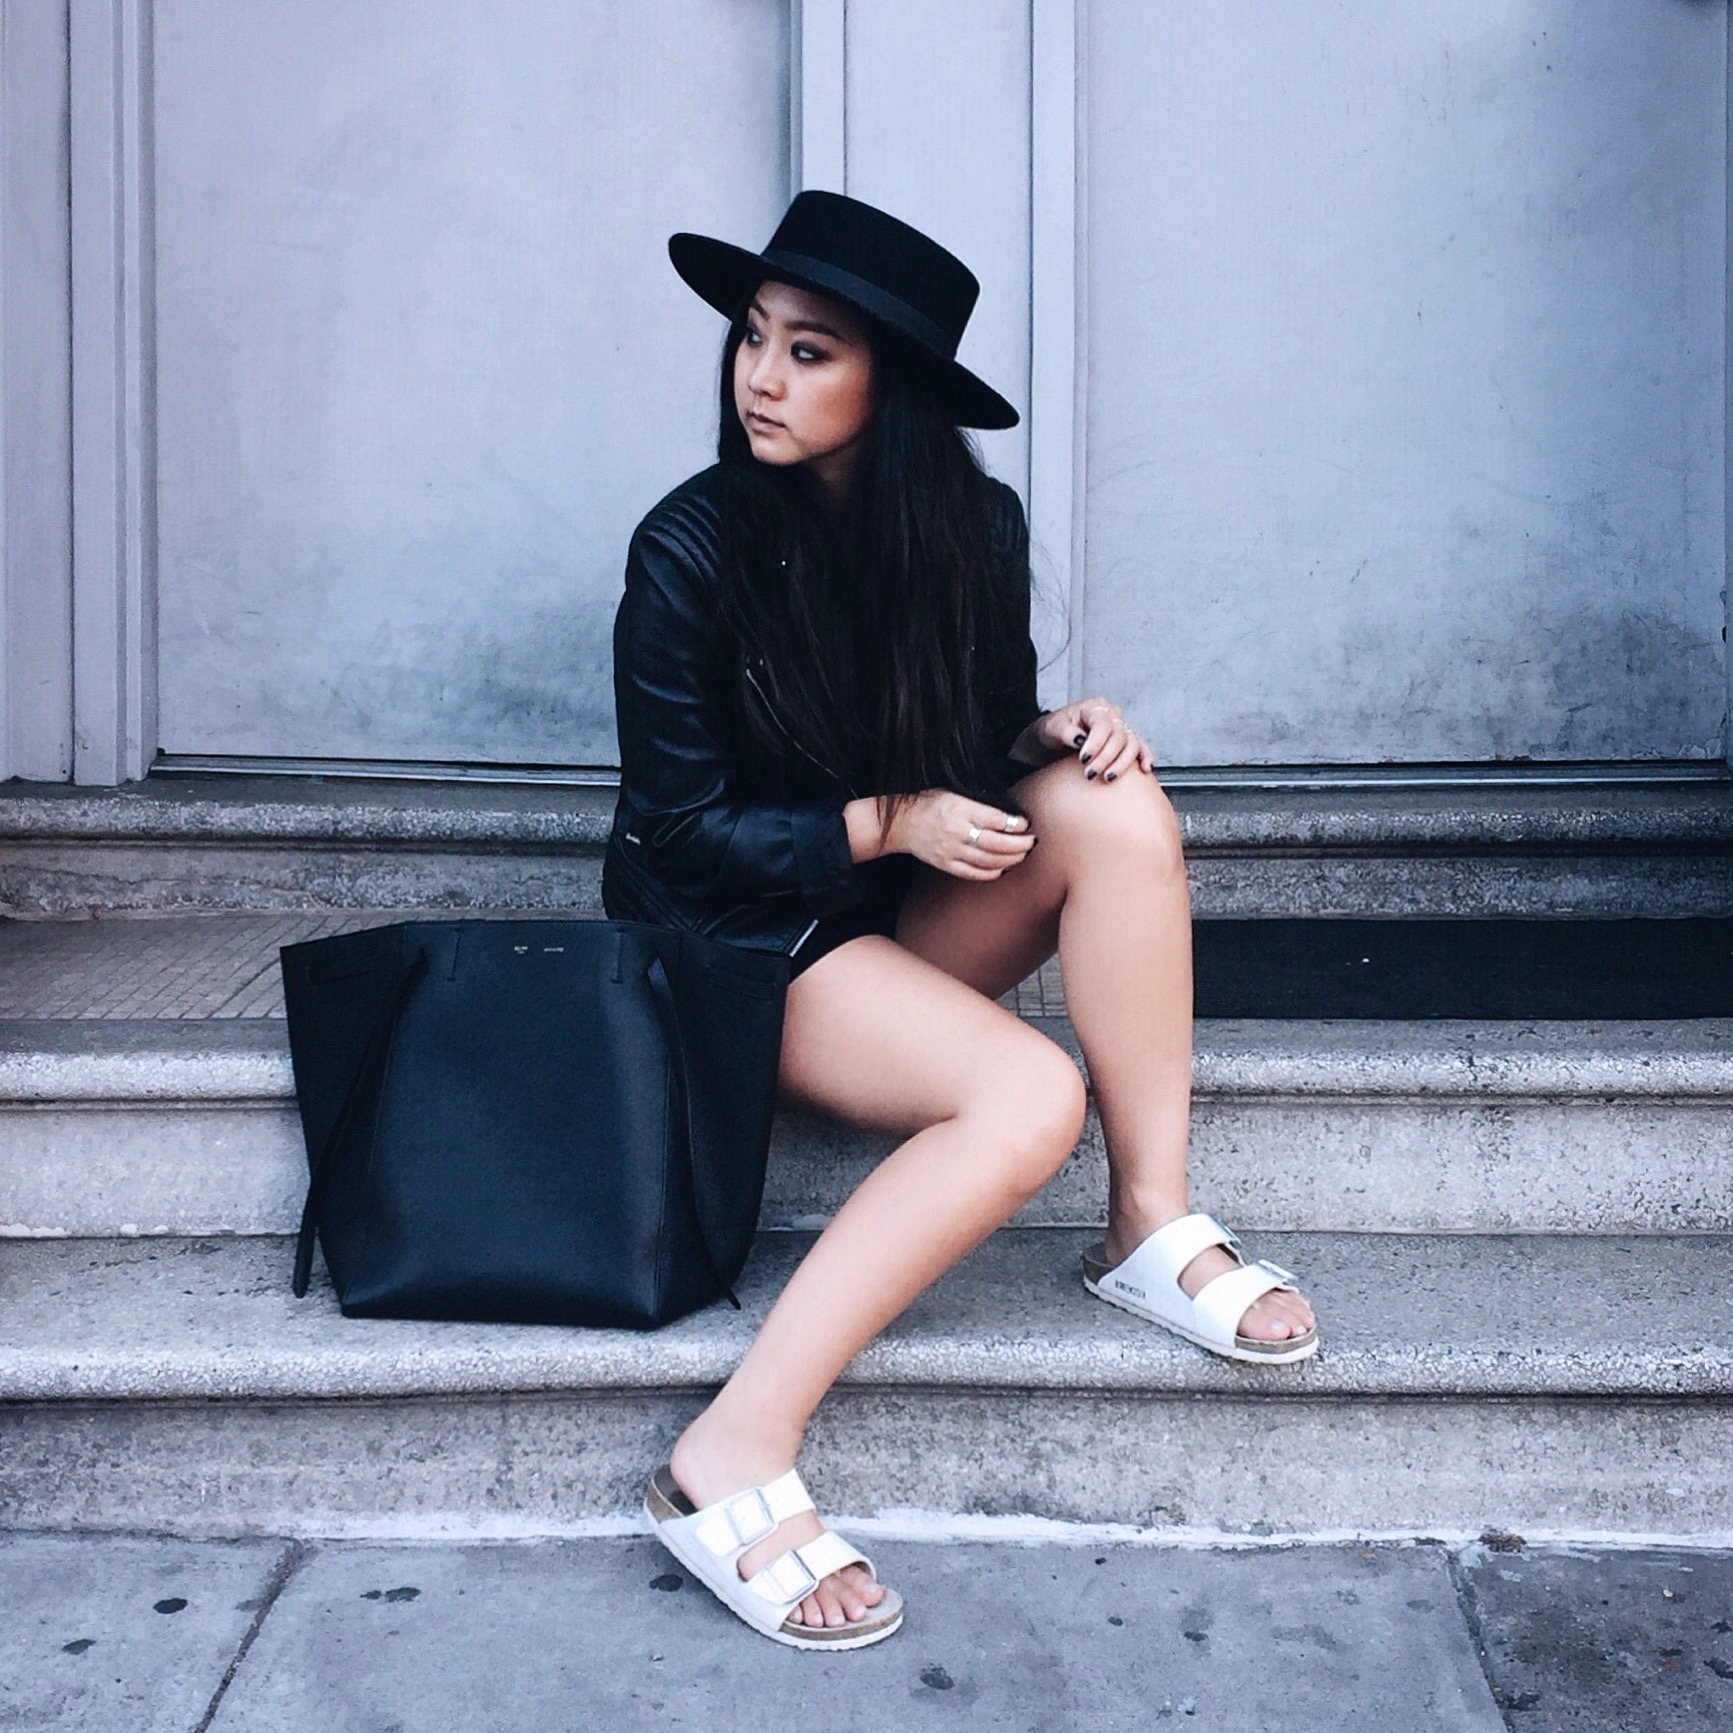 BIRKENSTOCK   sandals   / MANGO  leather jacket   (similar  here )  / MANGO   romper   / CELINE  Phantom   tote /  JANESSA LEONE   Gabrielle hat